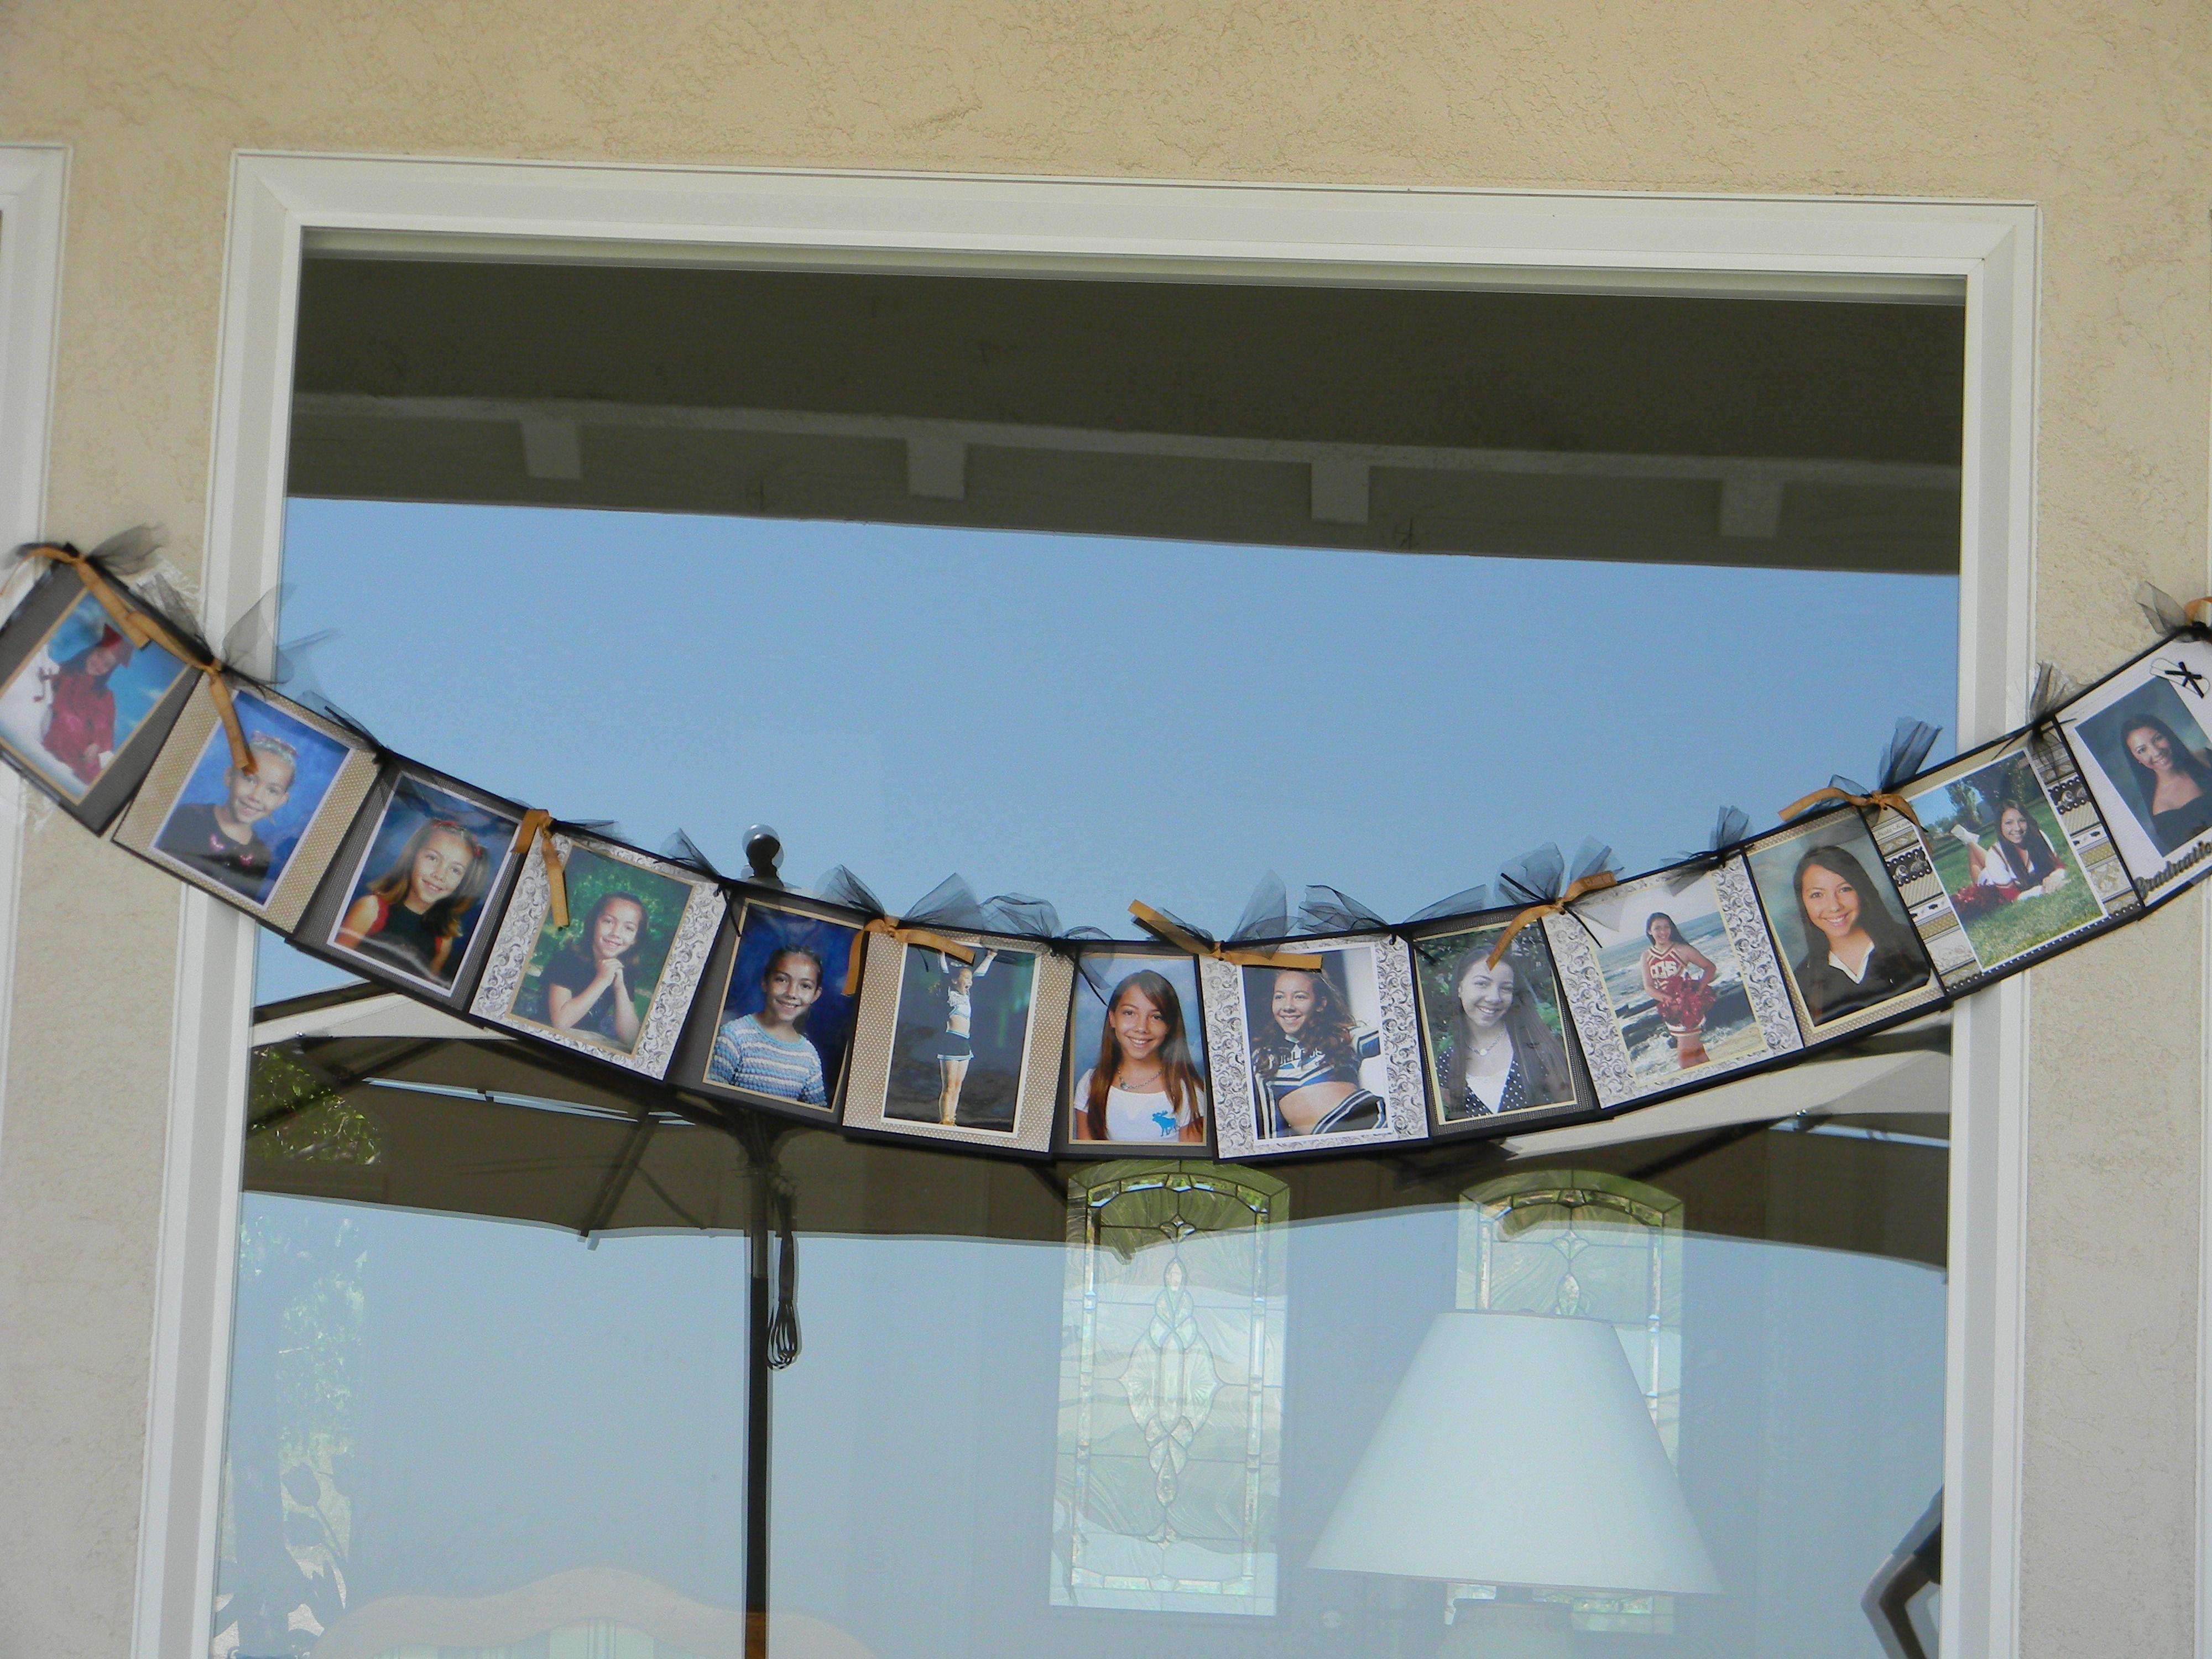 Graduation banner photos from every year kindergarten through